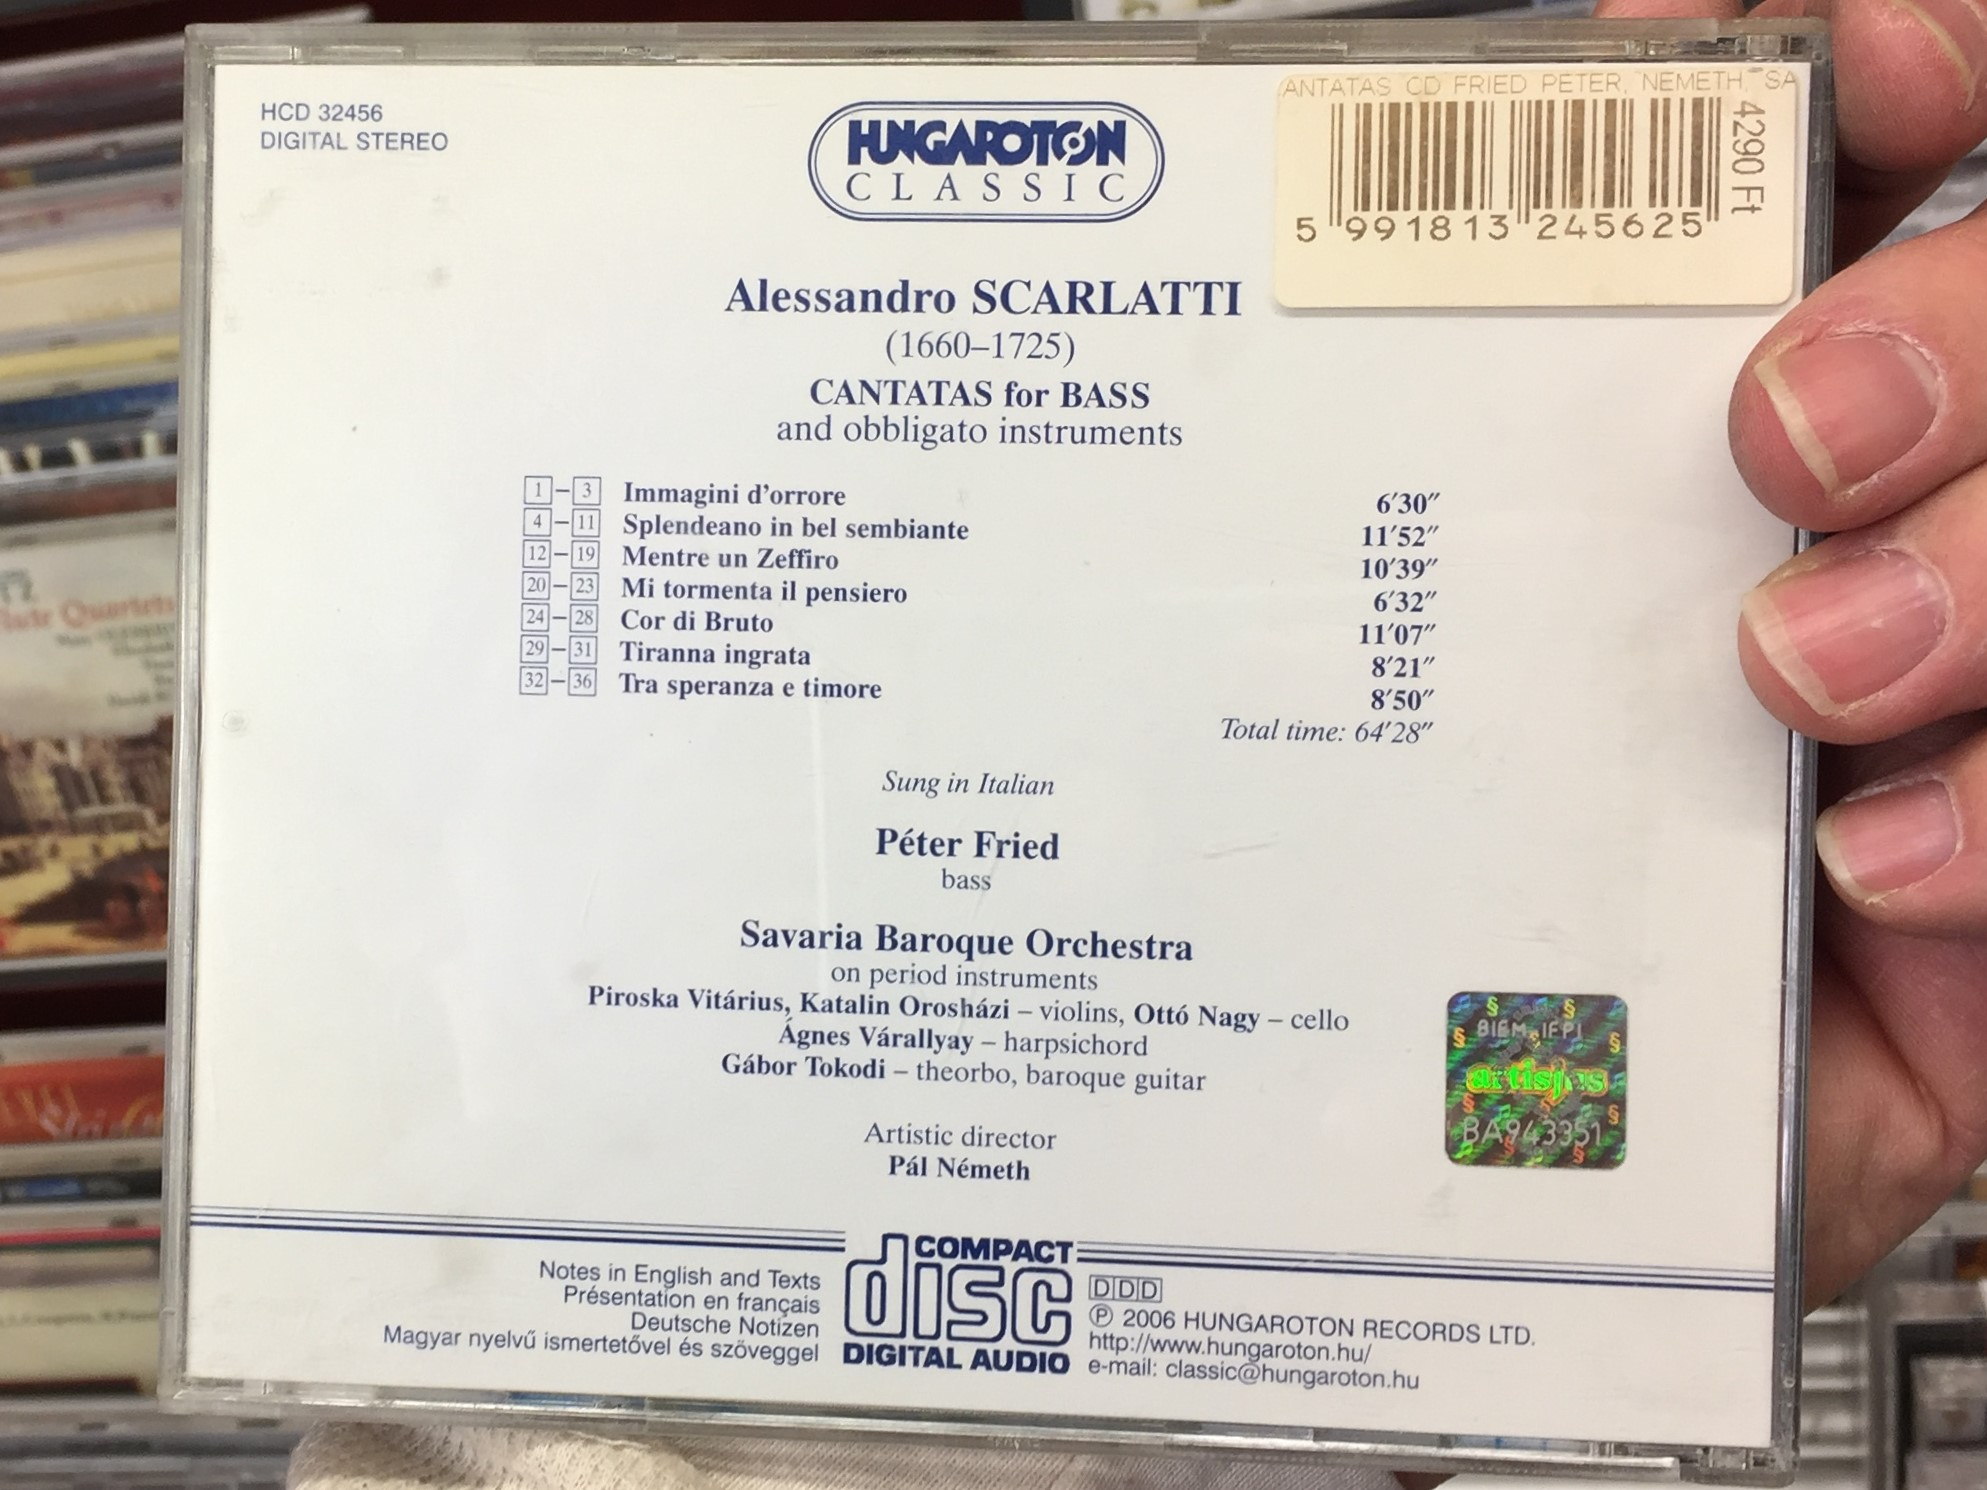 alessandro-scarlatti-cantatas-for-bass-obbligato-instruments-peter-fried-bass-savaria-baroque-orchestra-on-period-instruments-pal-nemeth-artistic-director-hungaroton-classic-audio-cd-20.jpg